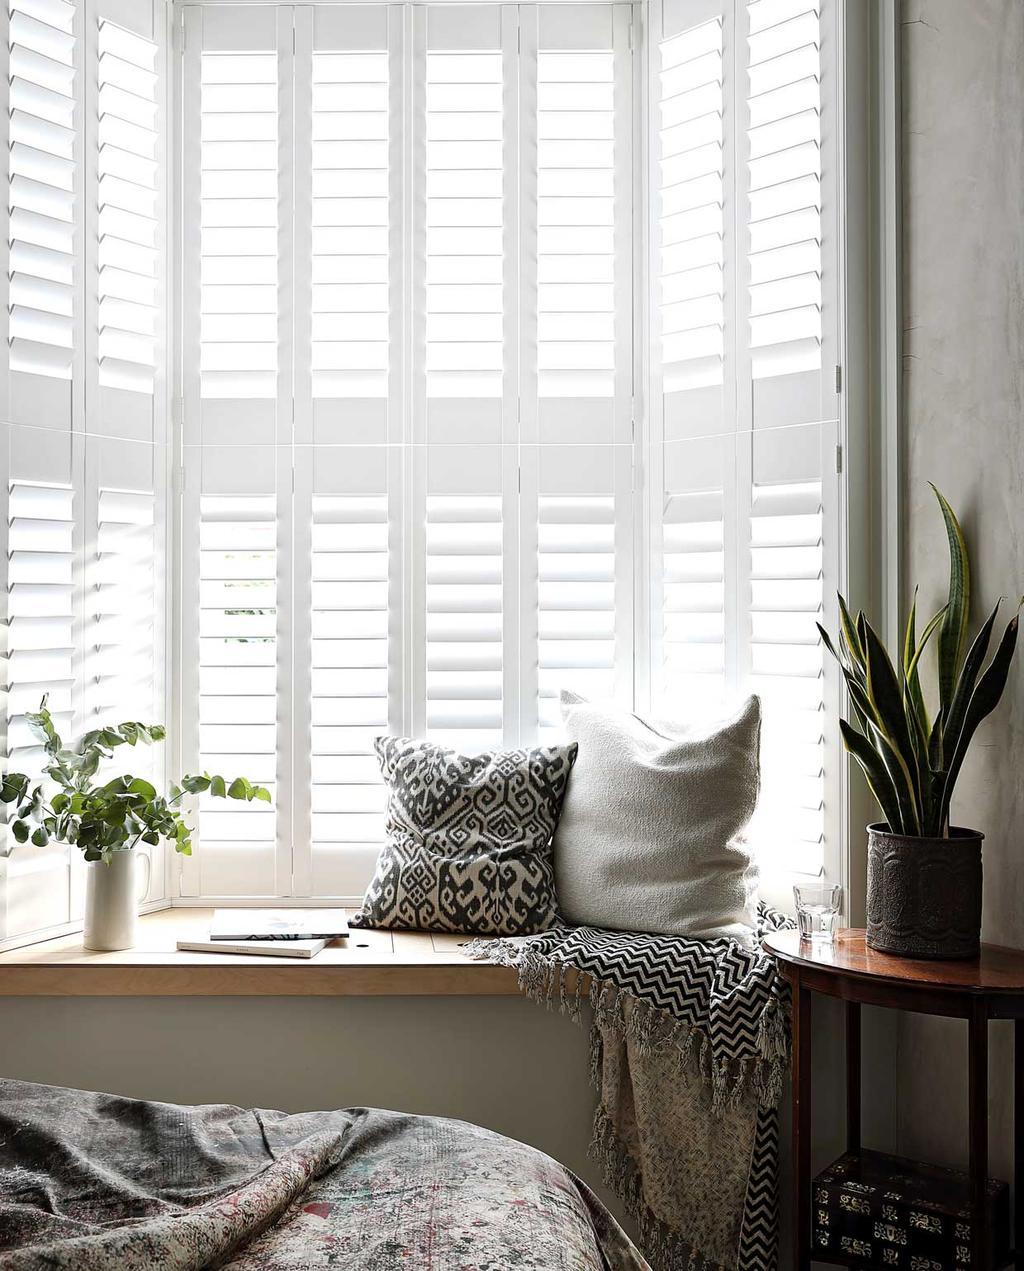 vtwonen bk special 03-2020 | knus londens familiehuis vensterbank met witte kussens